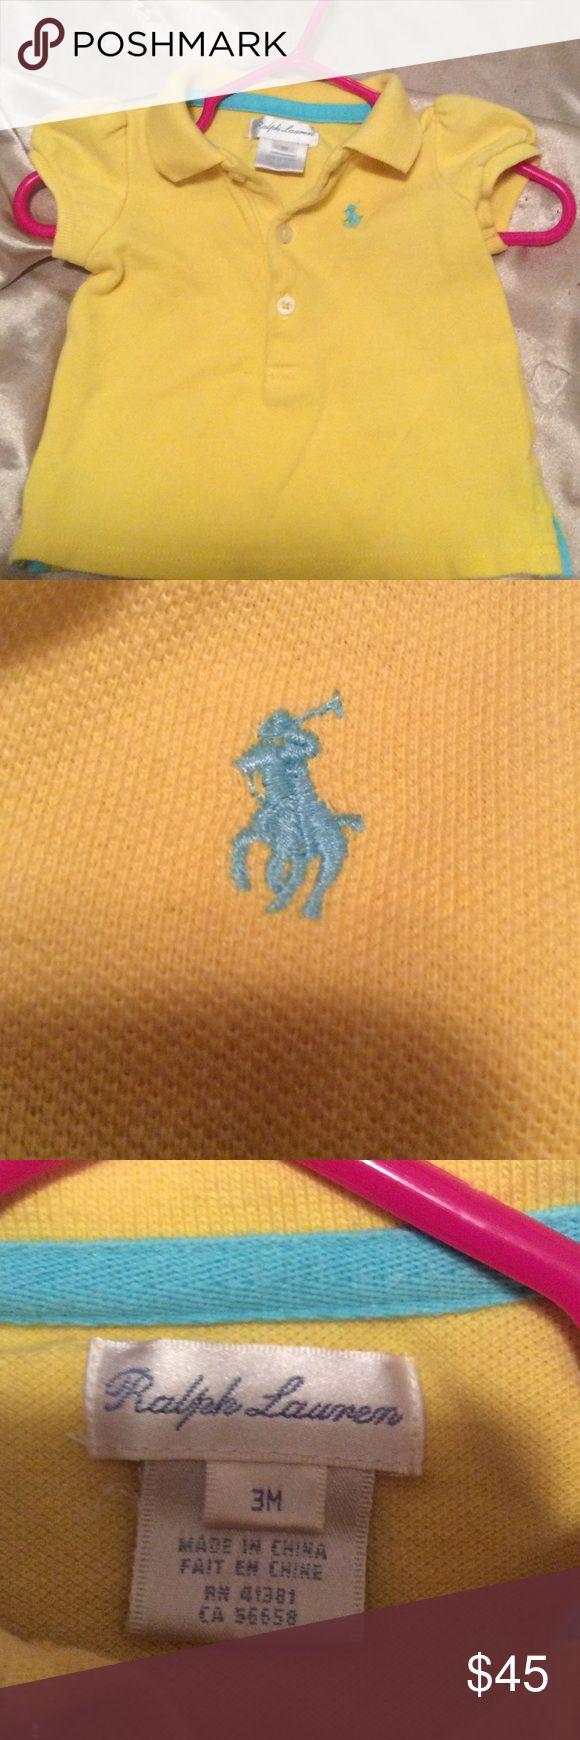 Baby Ralph Lauren polo shirt Yellow and blue Ralph Lauren polo shirt, good condition, no stains, pet/smoke free home Ralph Lauren Shirts & Tops Polos